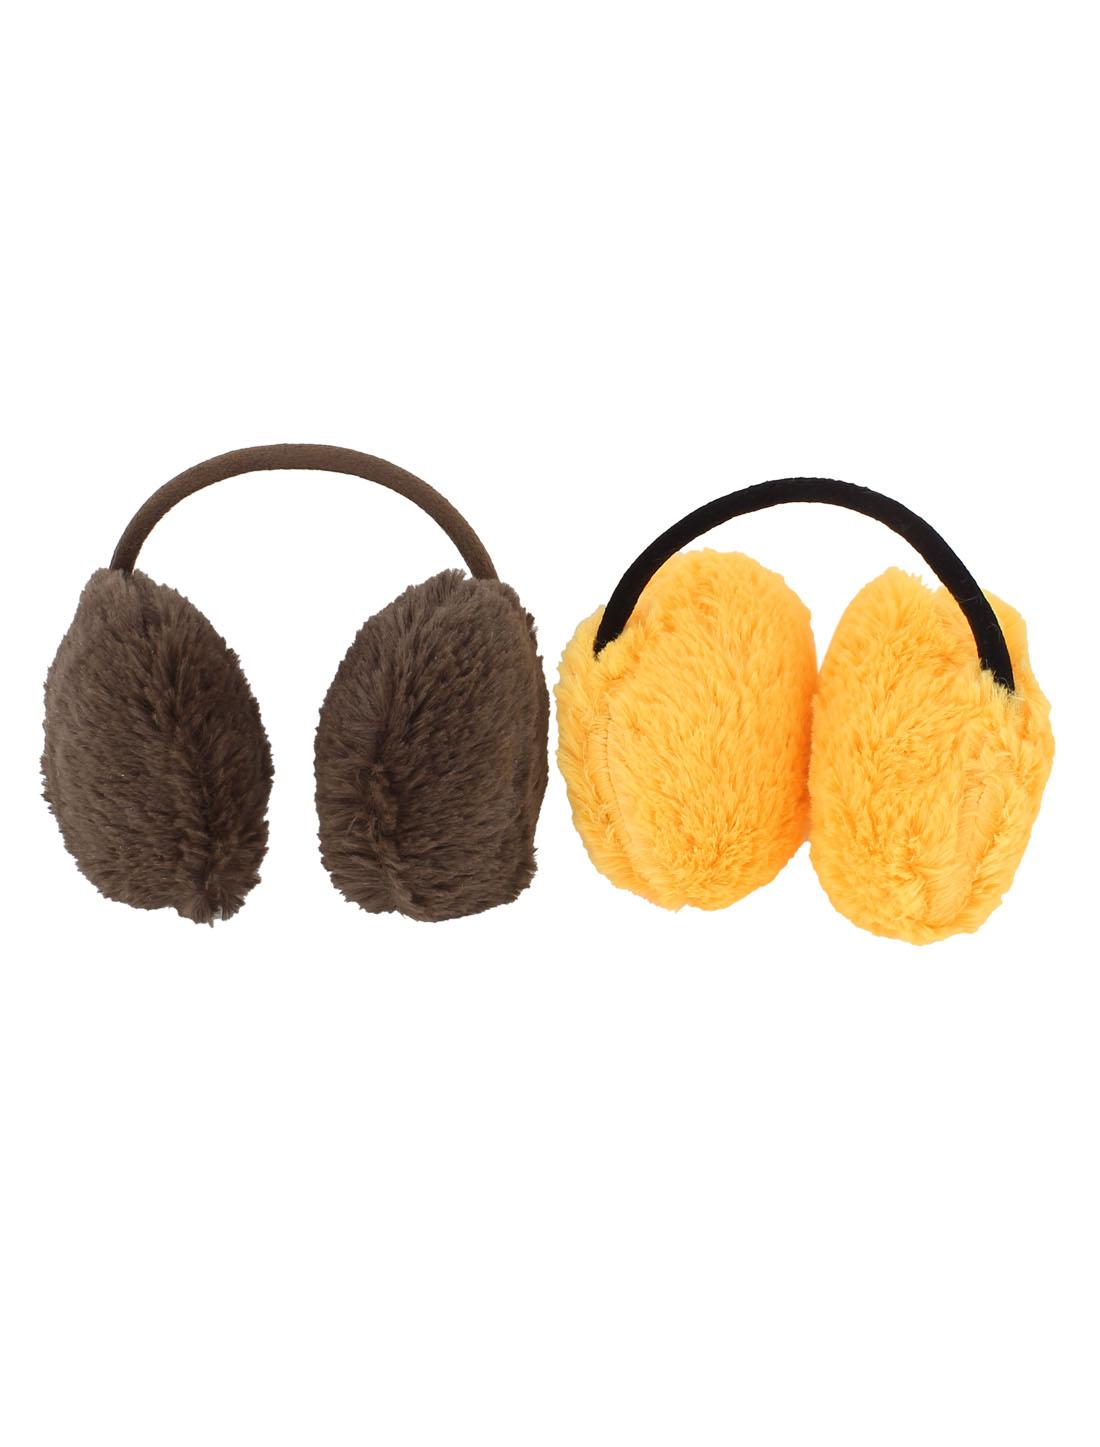 2 Pcs Winter Headware Plush Headset Shaped Soft Back Ear Warmers Earmuffs